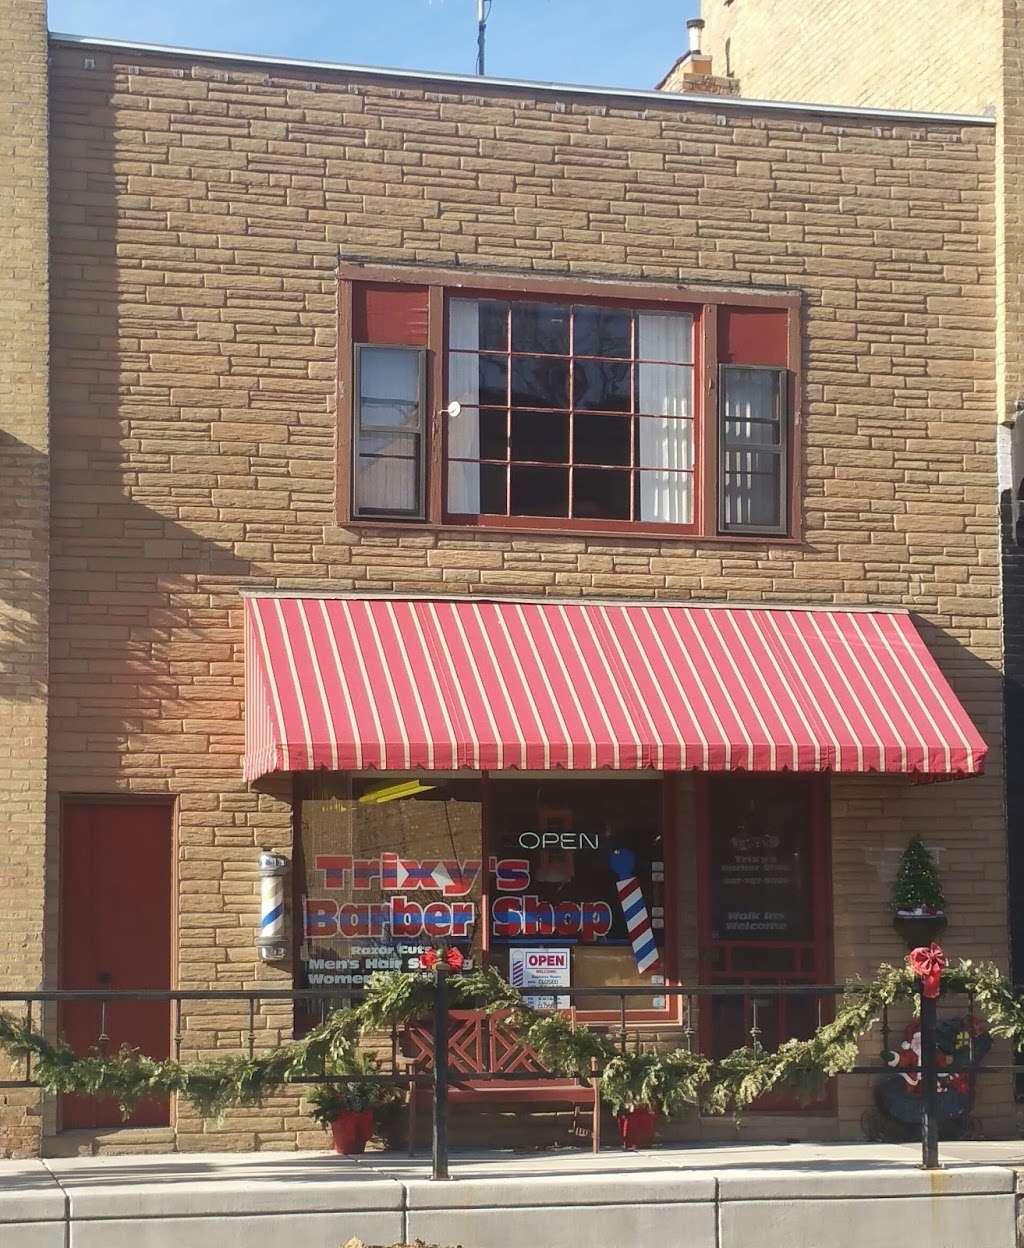 Trixys Barber Shop - hair care  | Photo 1 of 1 | Address: 10319 Main St, Richmond, IL 60071, USA | Phone: (847) 767-9080